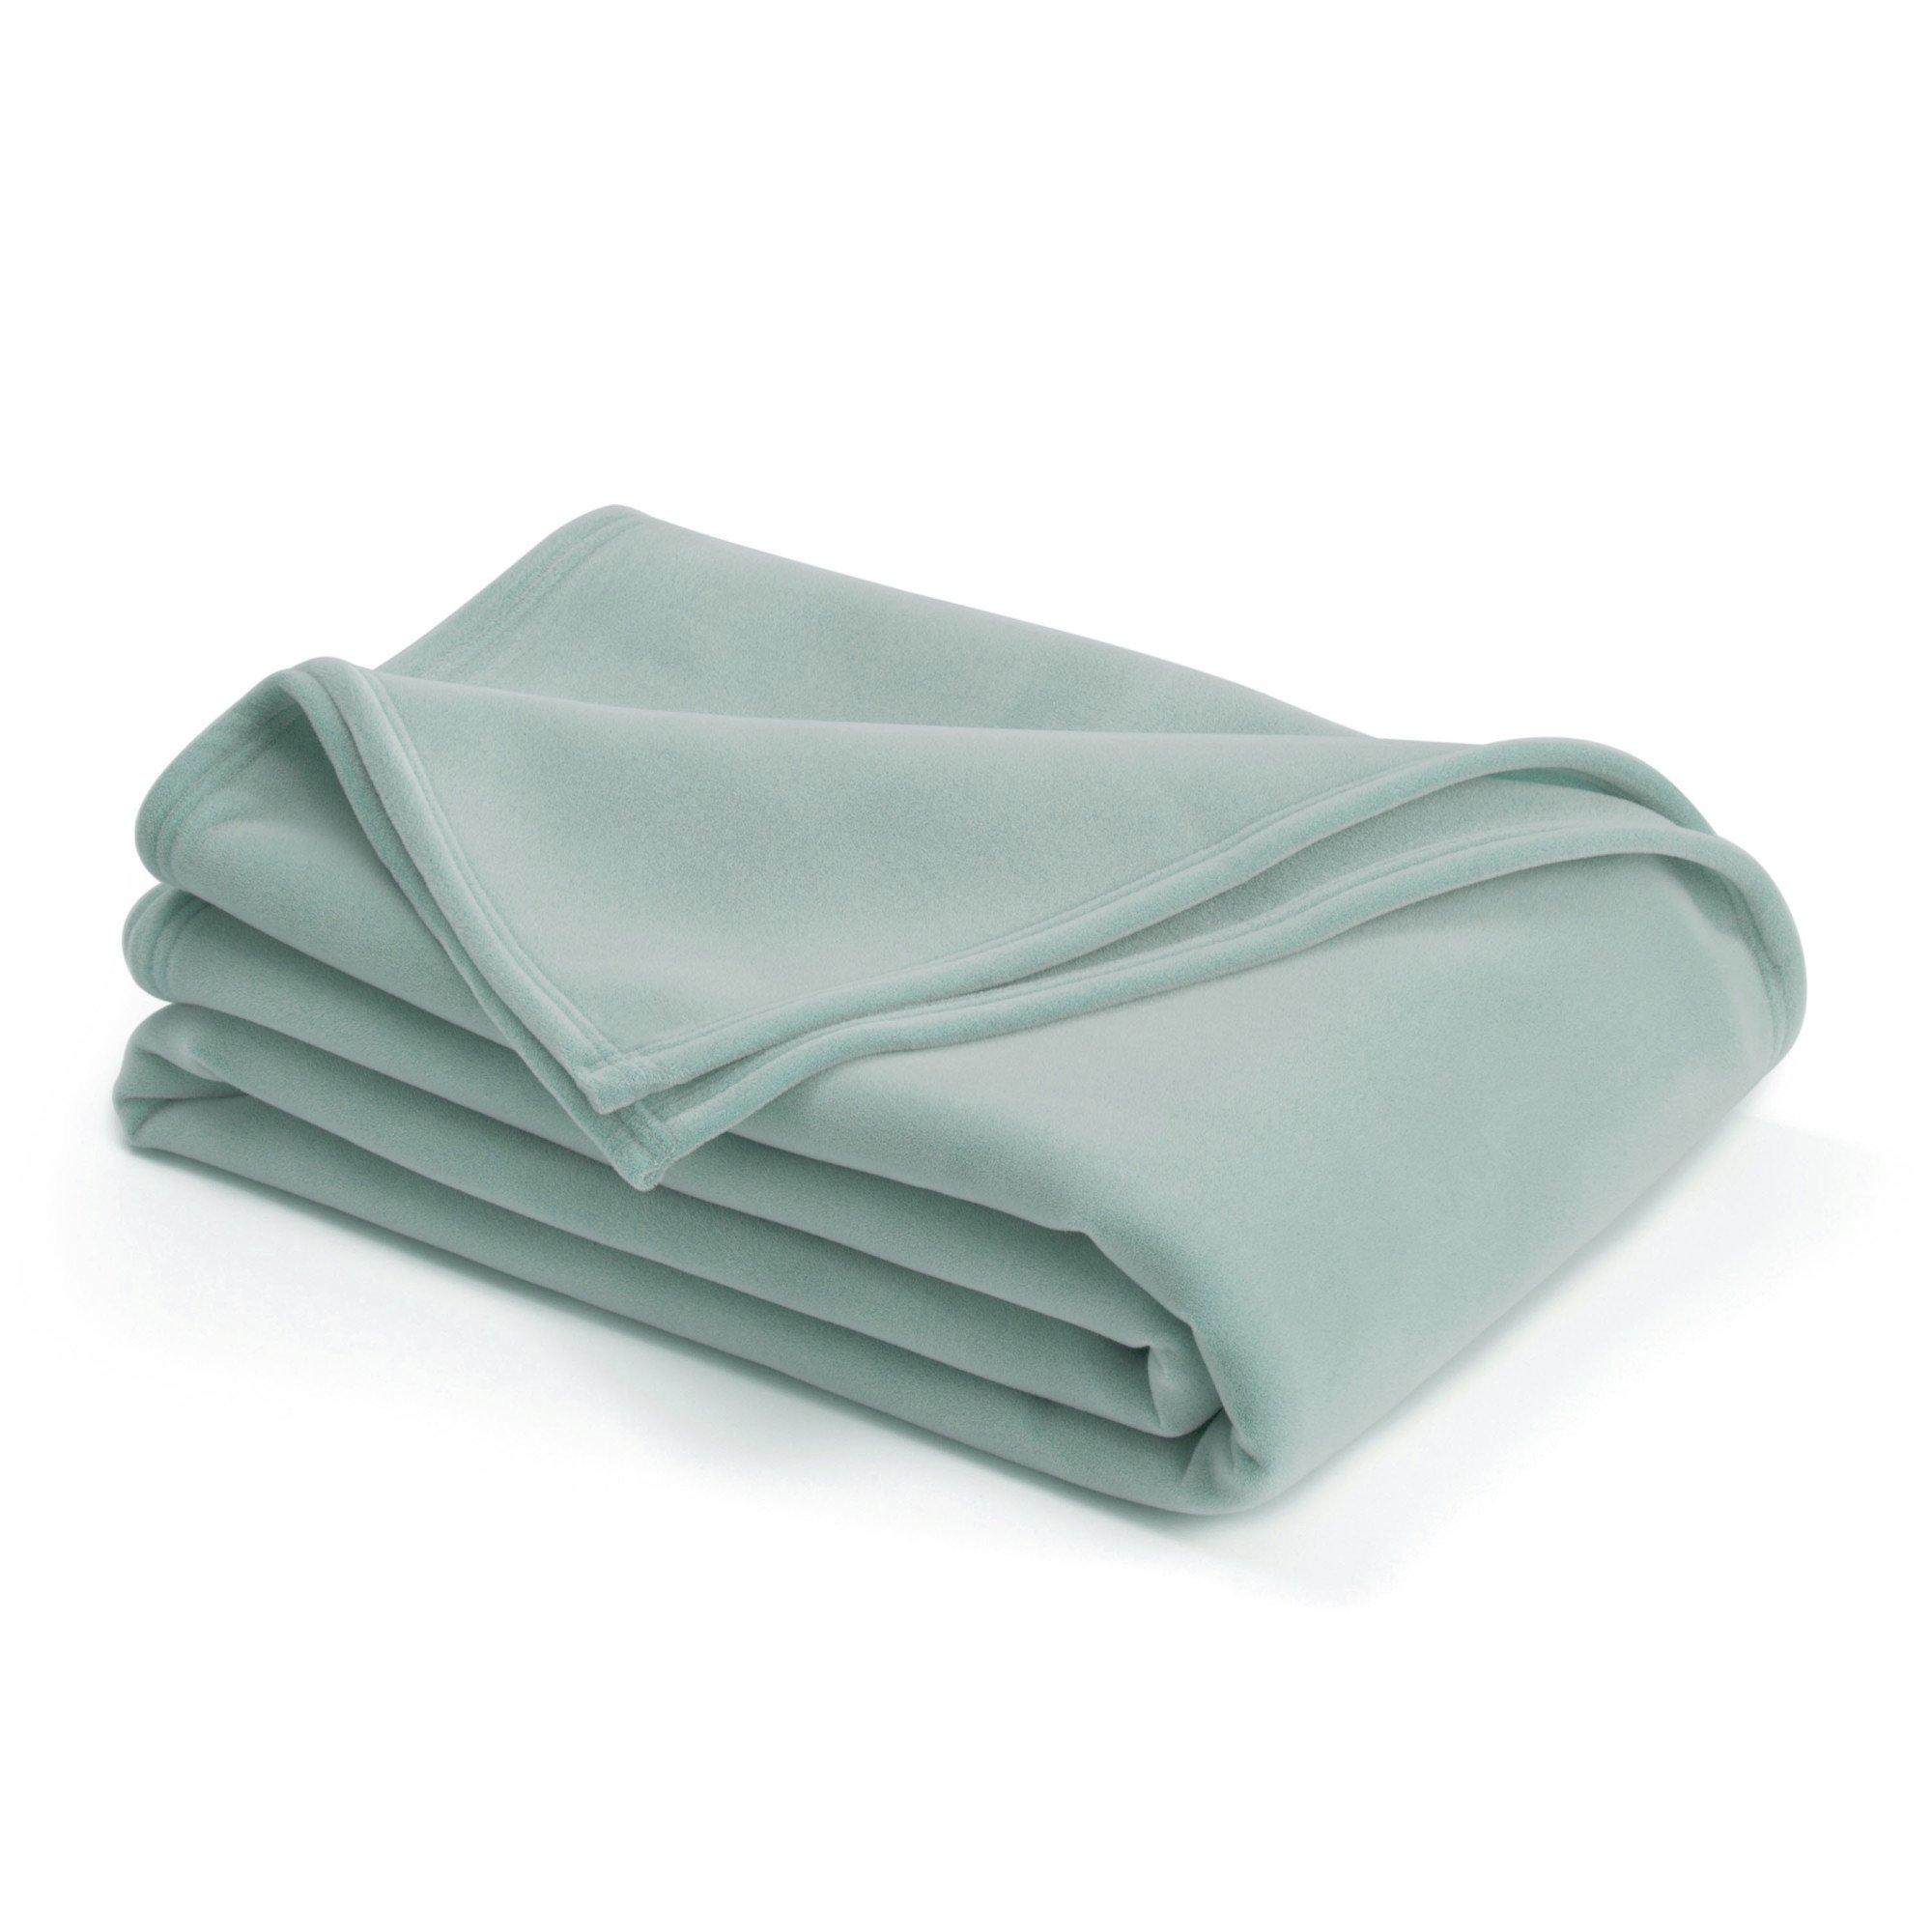 Vellux Original Blanket, Twin 66 x 90, Aqua